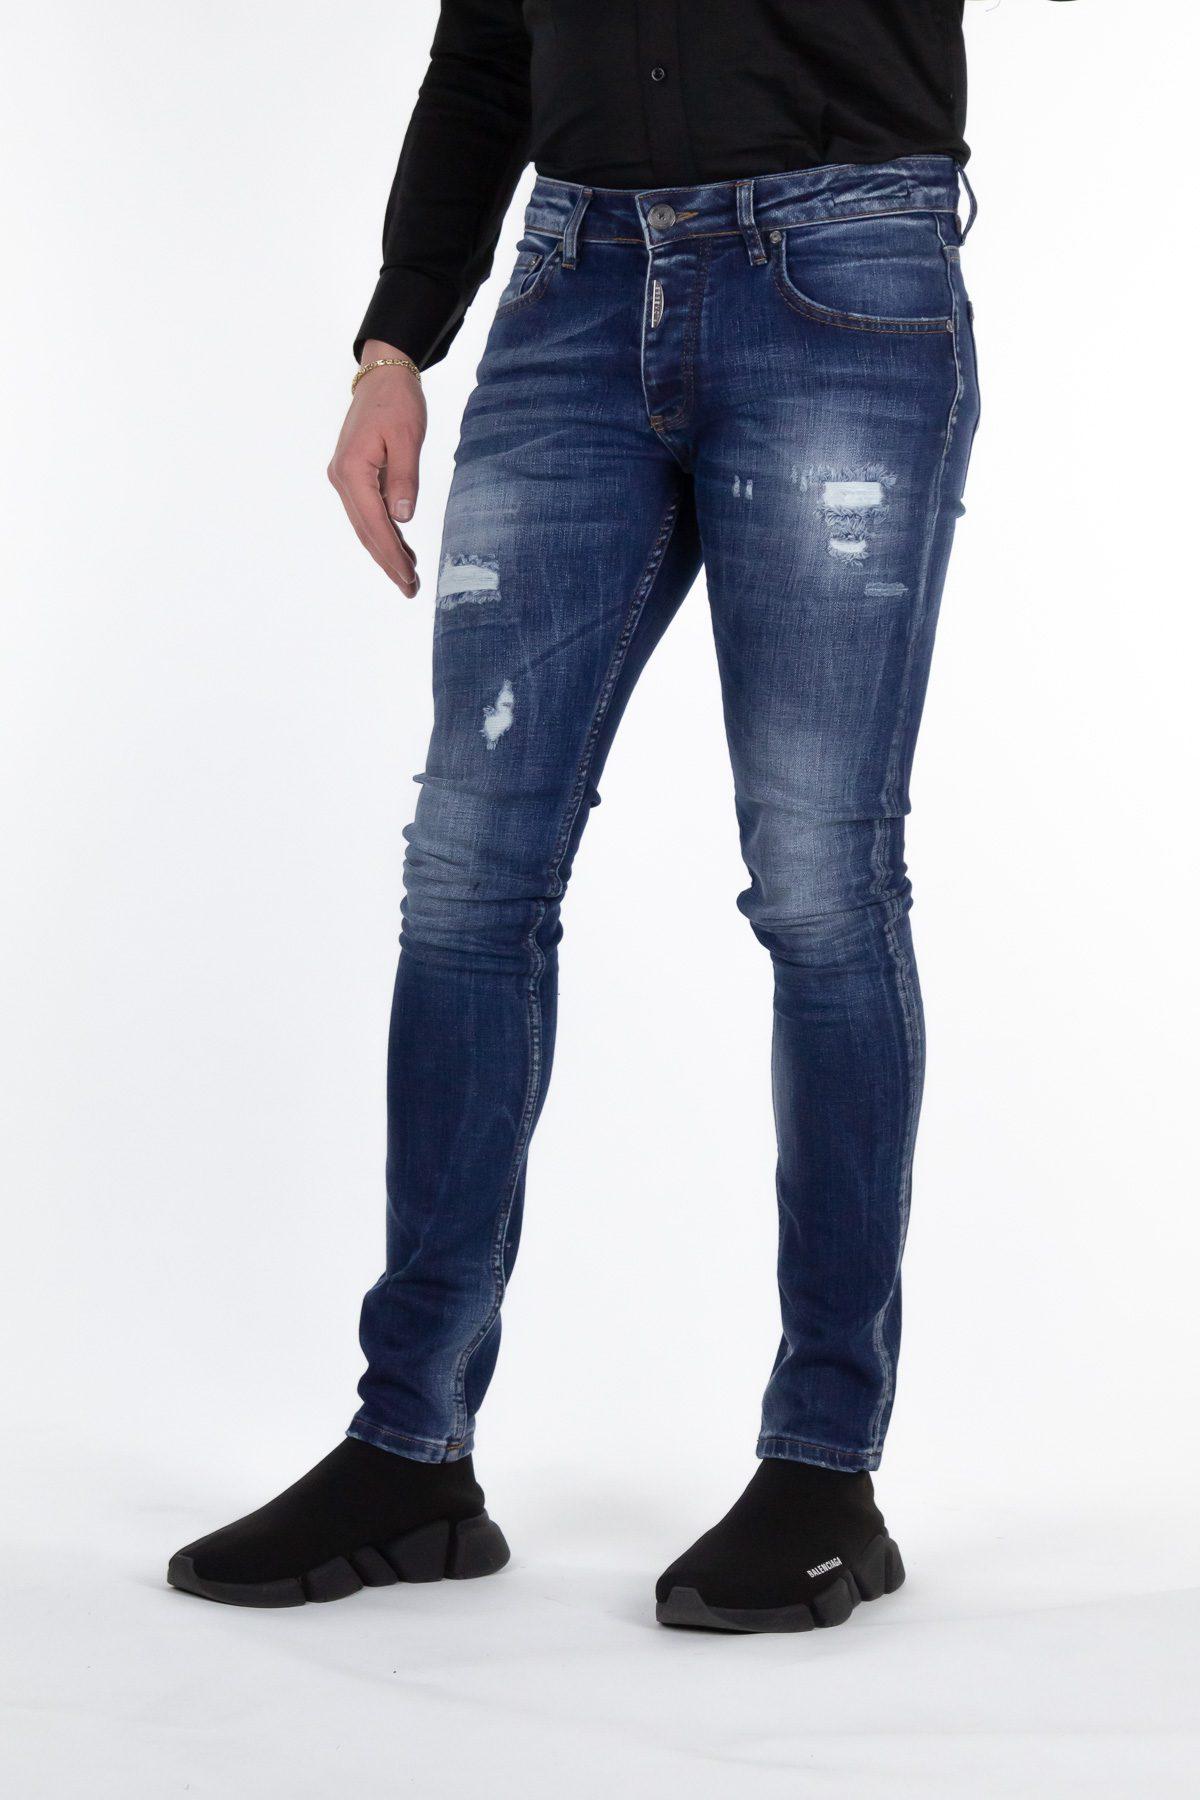 Richesse Charleroi Blue Jeans 2240-2